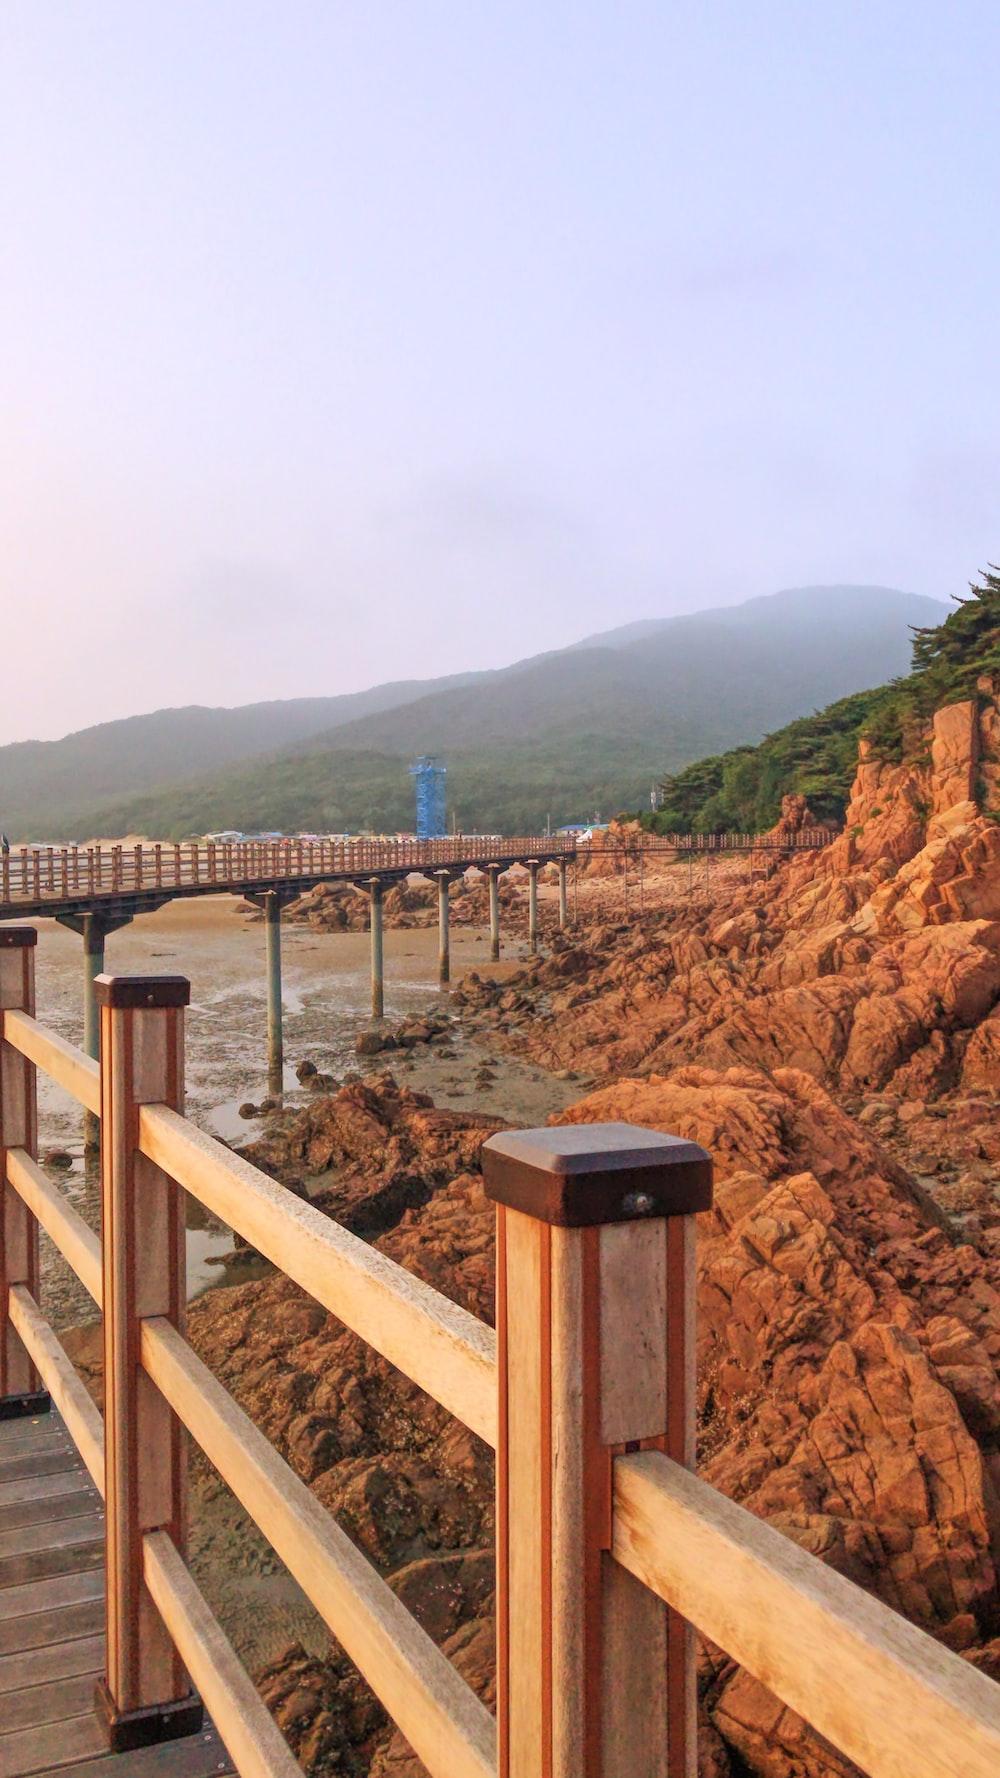 brown wooden bridge over the river